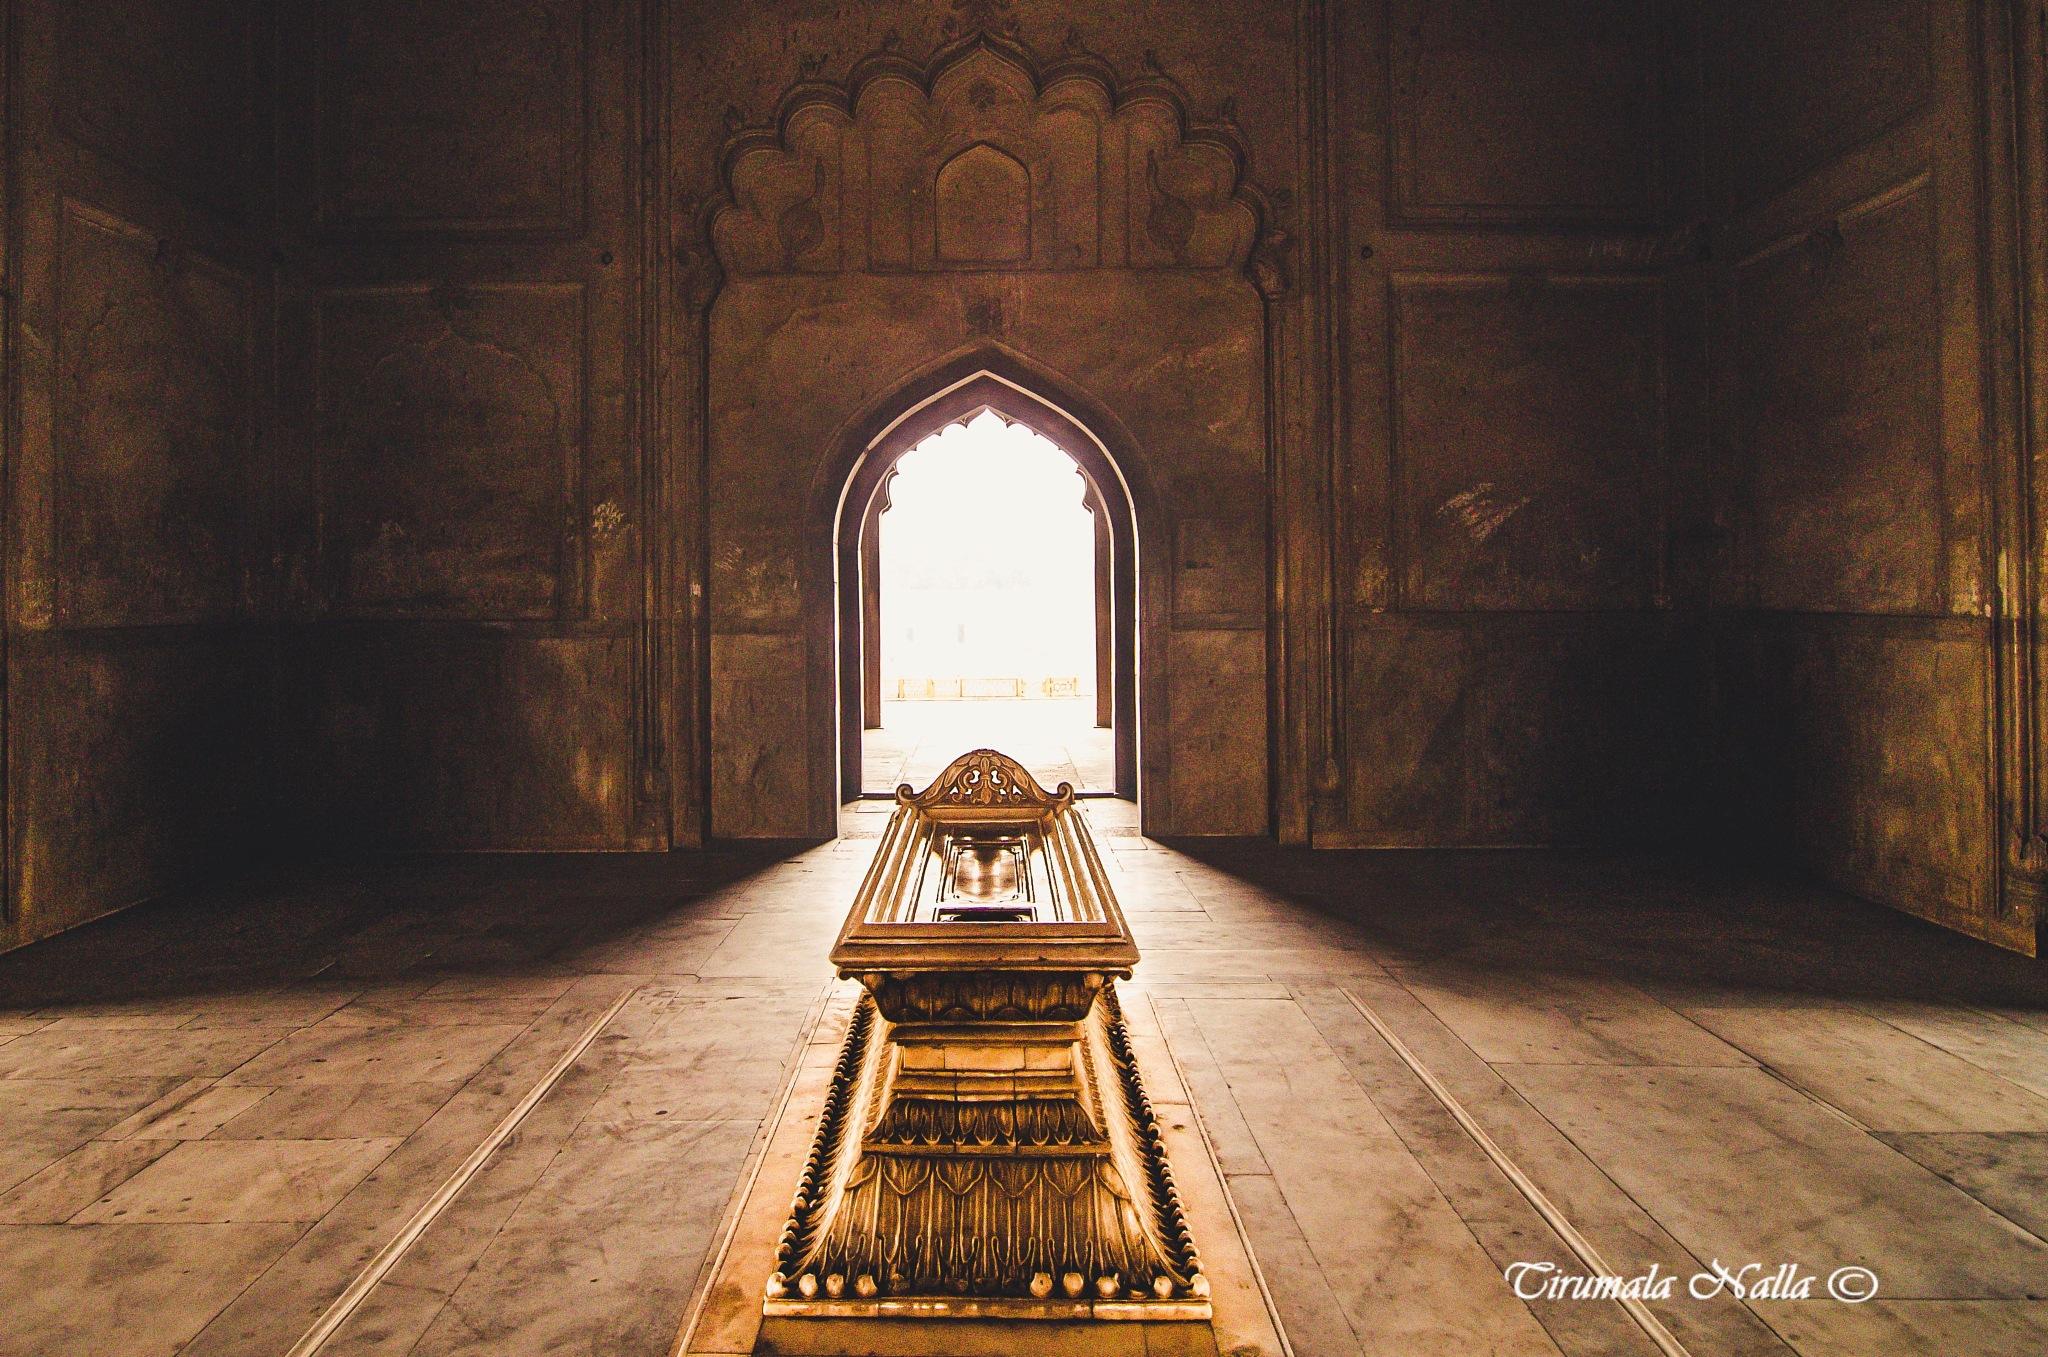 Divine light at the Gate by Tirumala Nalla